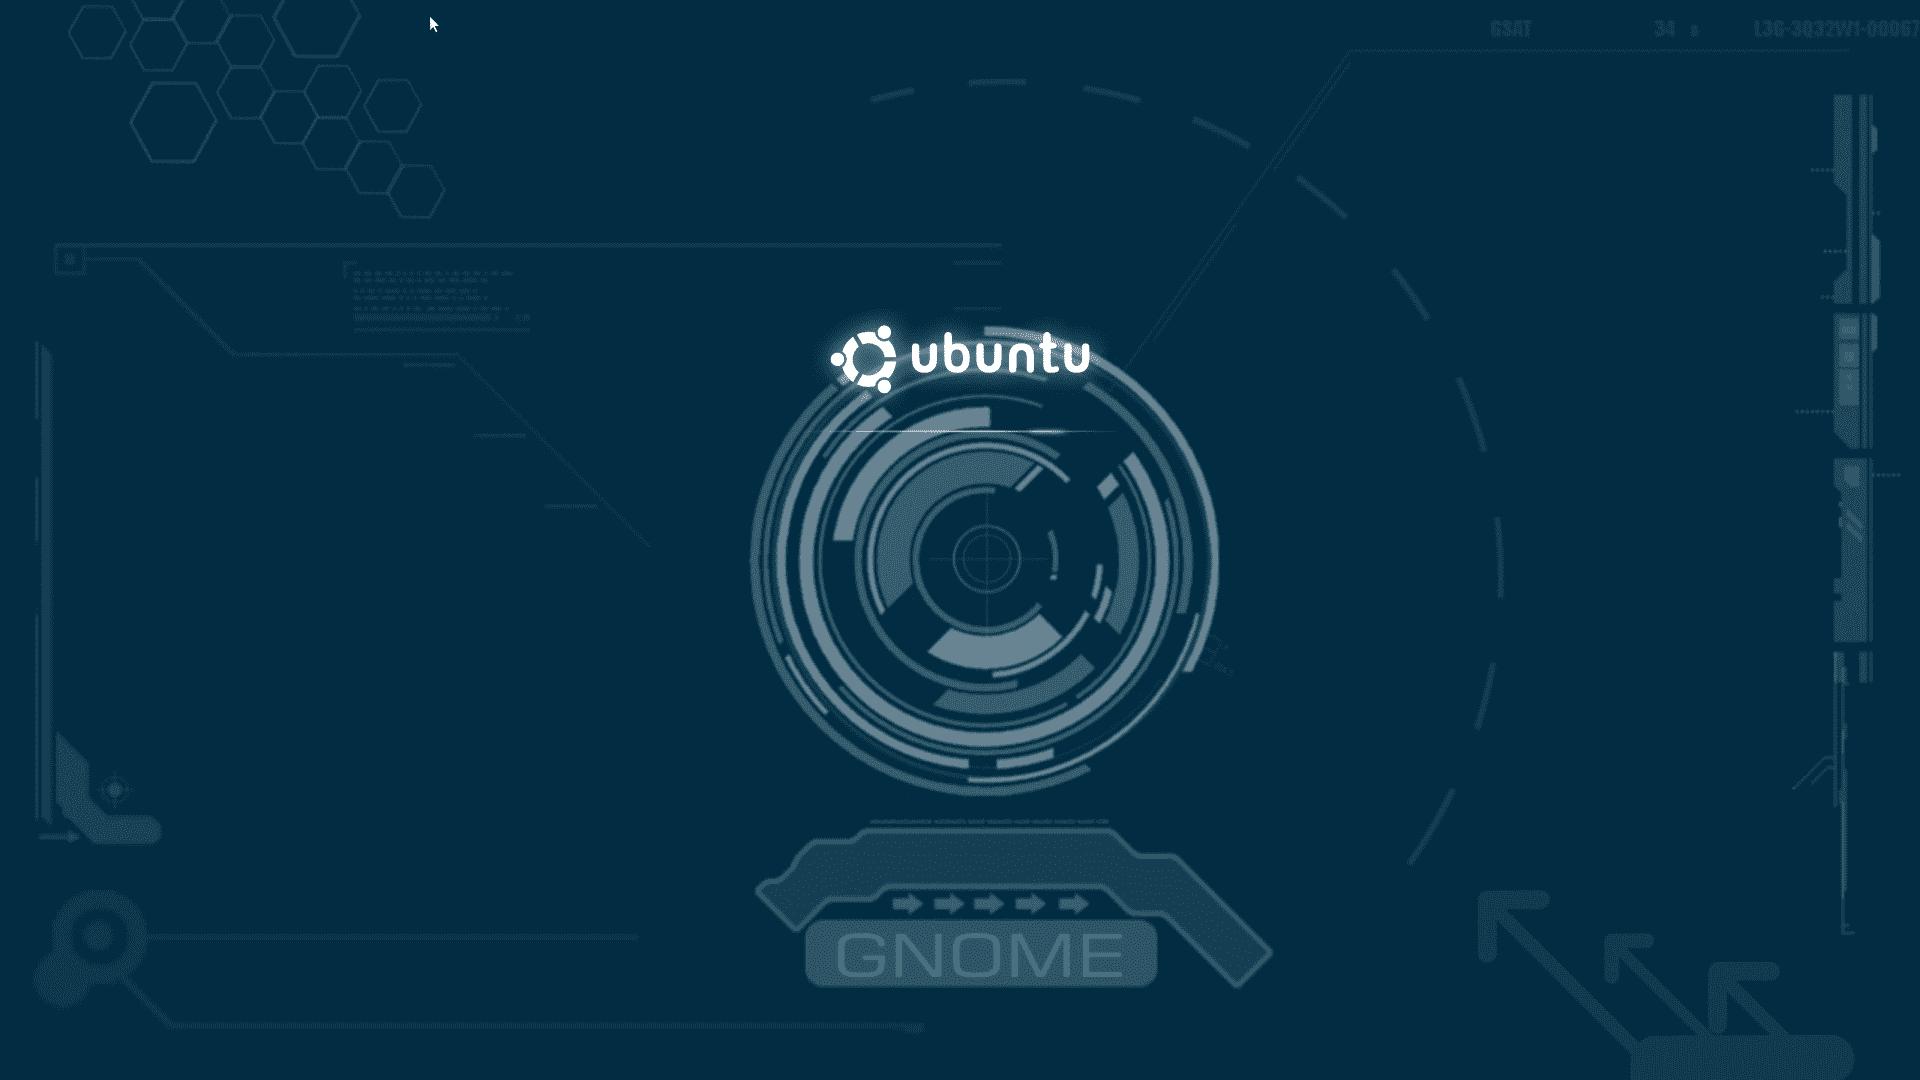 46 Free Ubuntu Wallpapers For Desktop And Laptops